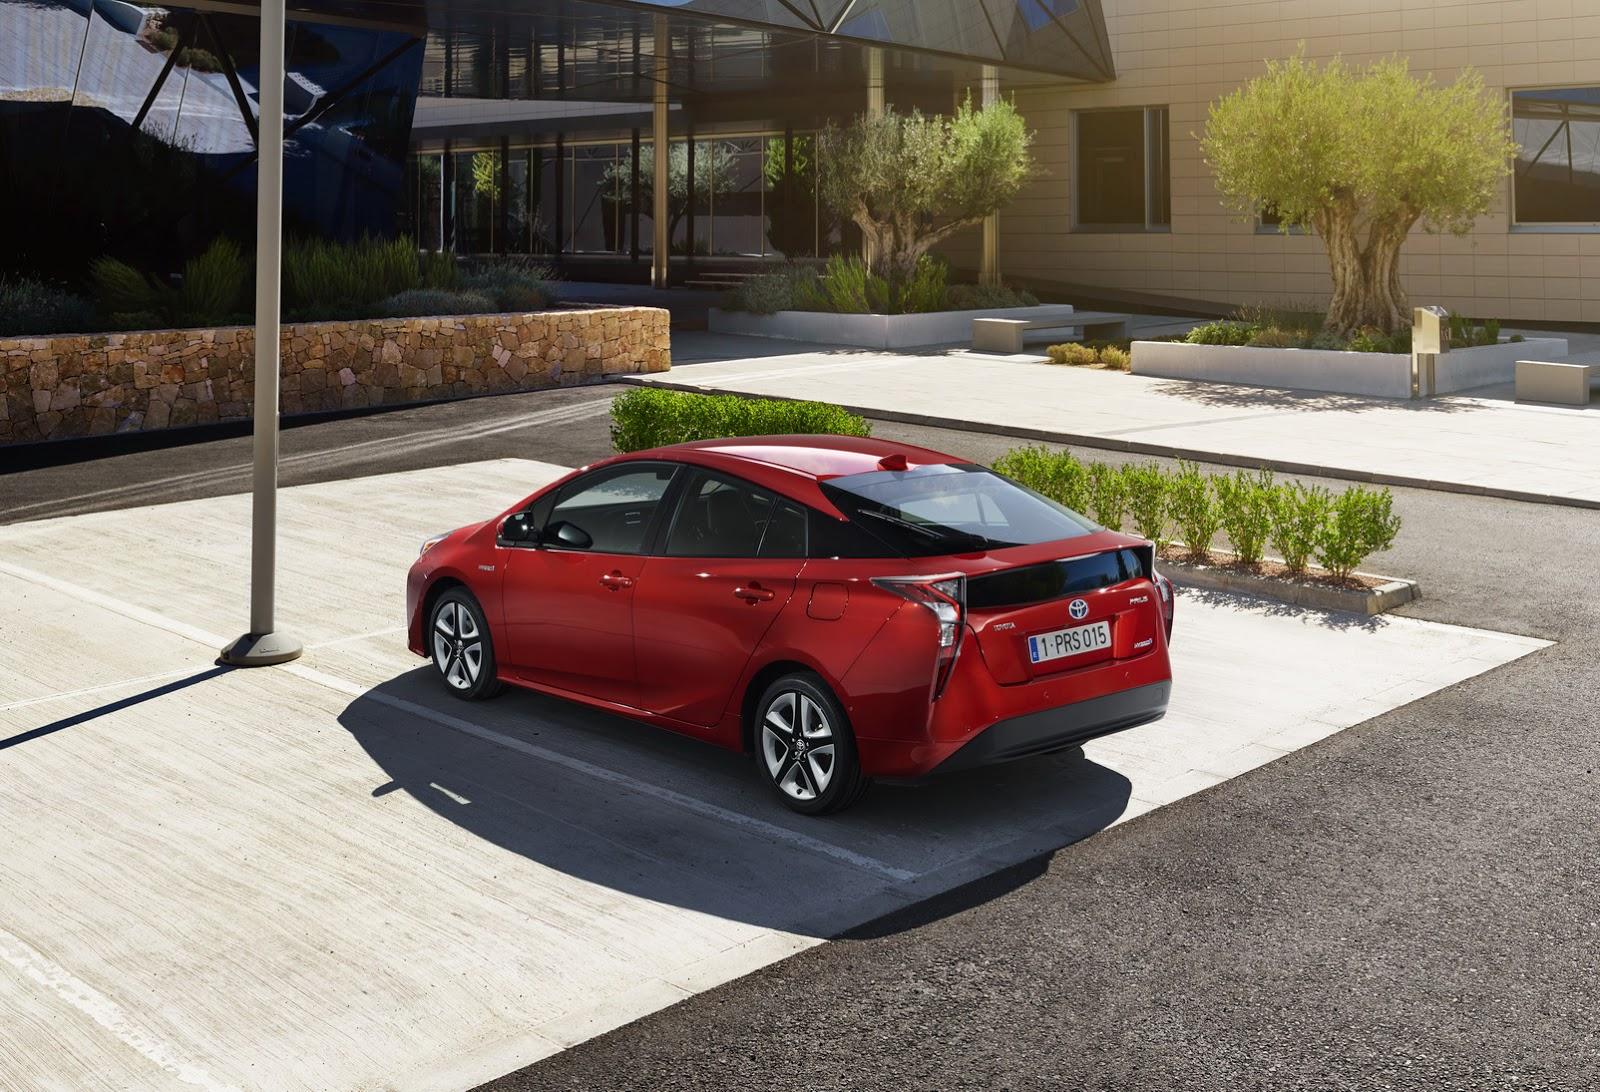 Nuova-Toyota-Prius-2016-3